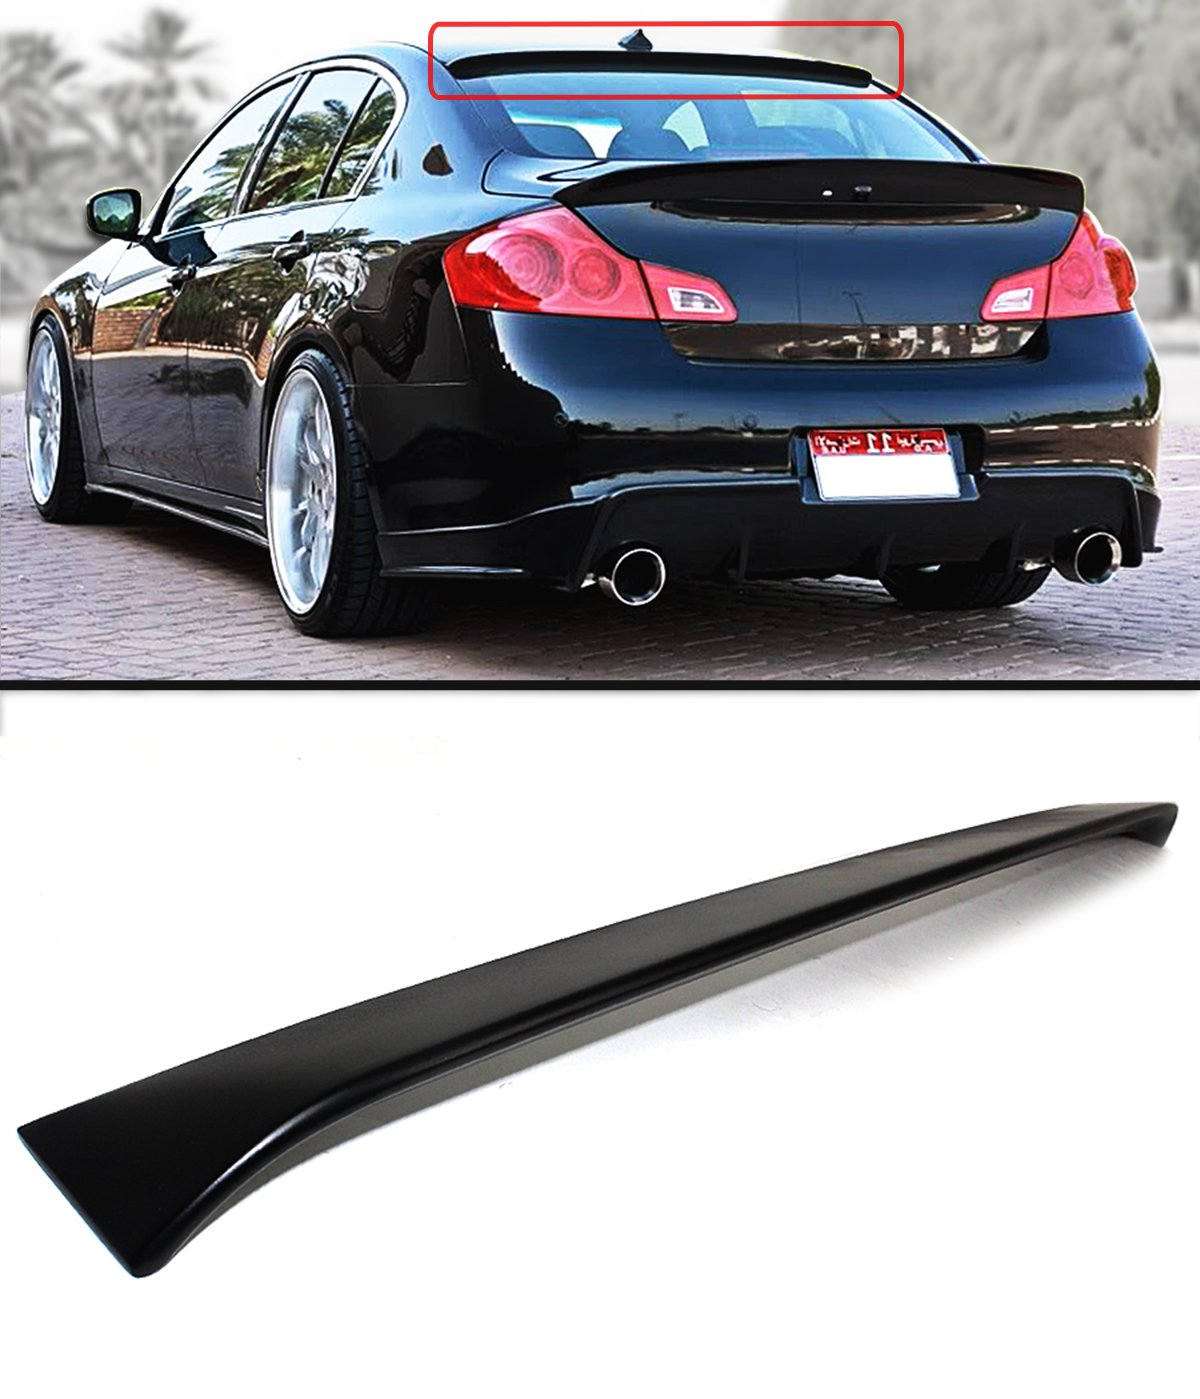 Cuztom Tuning for 2007-2015 Infiniti G35 G37 Q40 4DR Sedan Primer Black JDM  VIP Rear Window ROOF Spoiler Wing